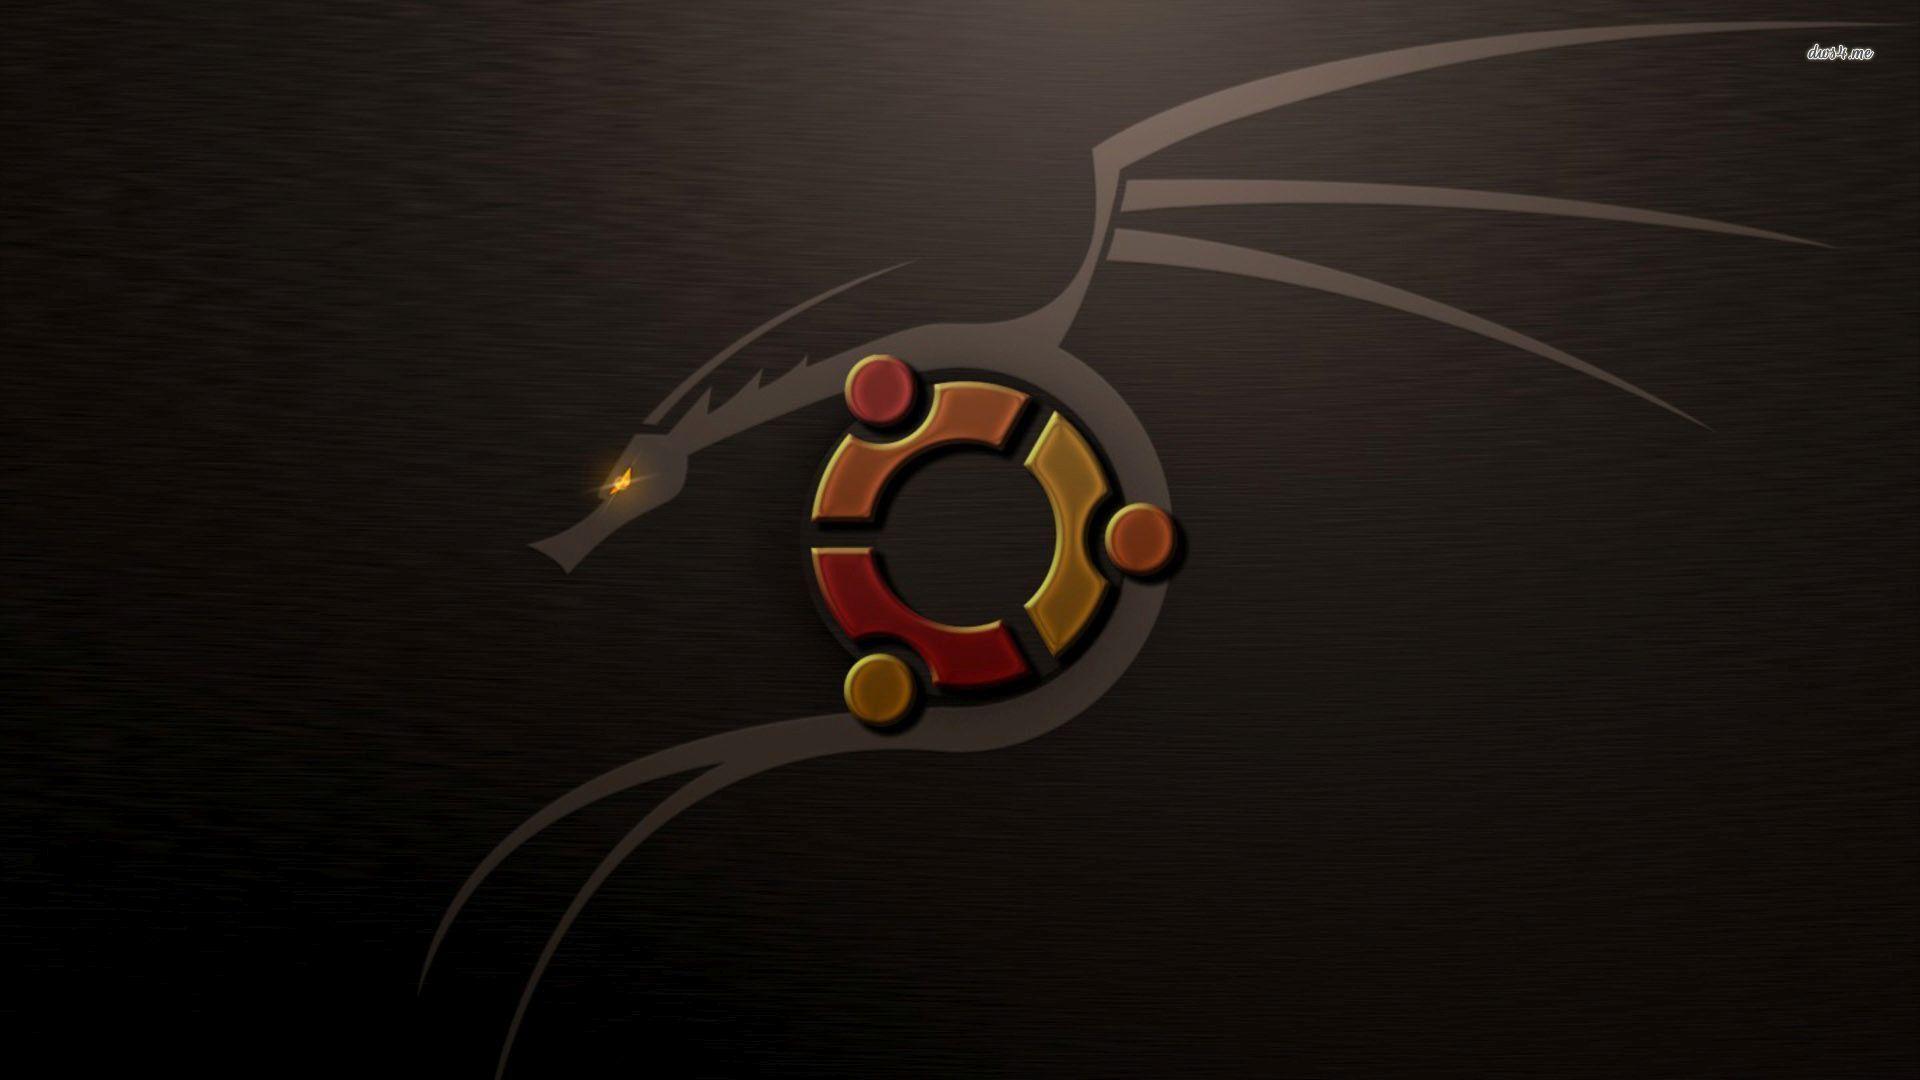 ubuntu wallpaper linux morzze - photo #39